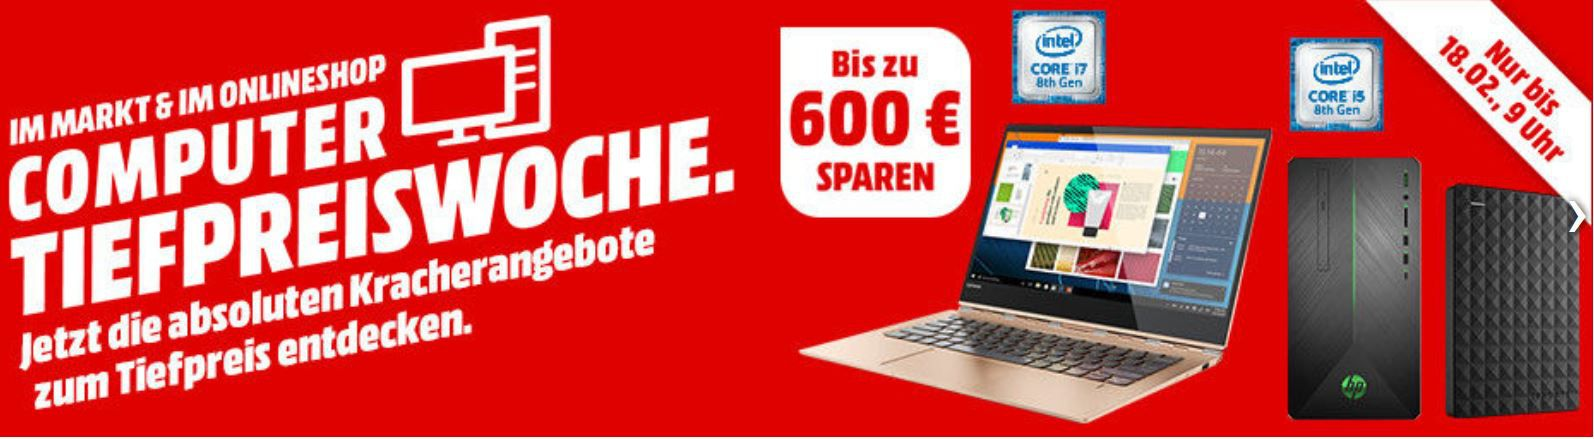 MM Top Computer Tiefpreiswoche: letzter Tag z.B.: LENOVO Yoga 920 Convertible i7, 512 GB SSD, 8 GB RAM für 1.399€ (statt 1.700€)